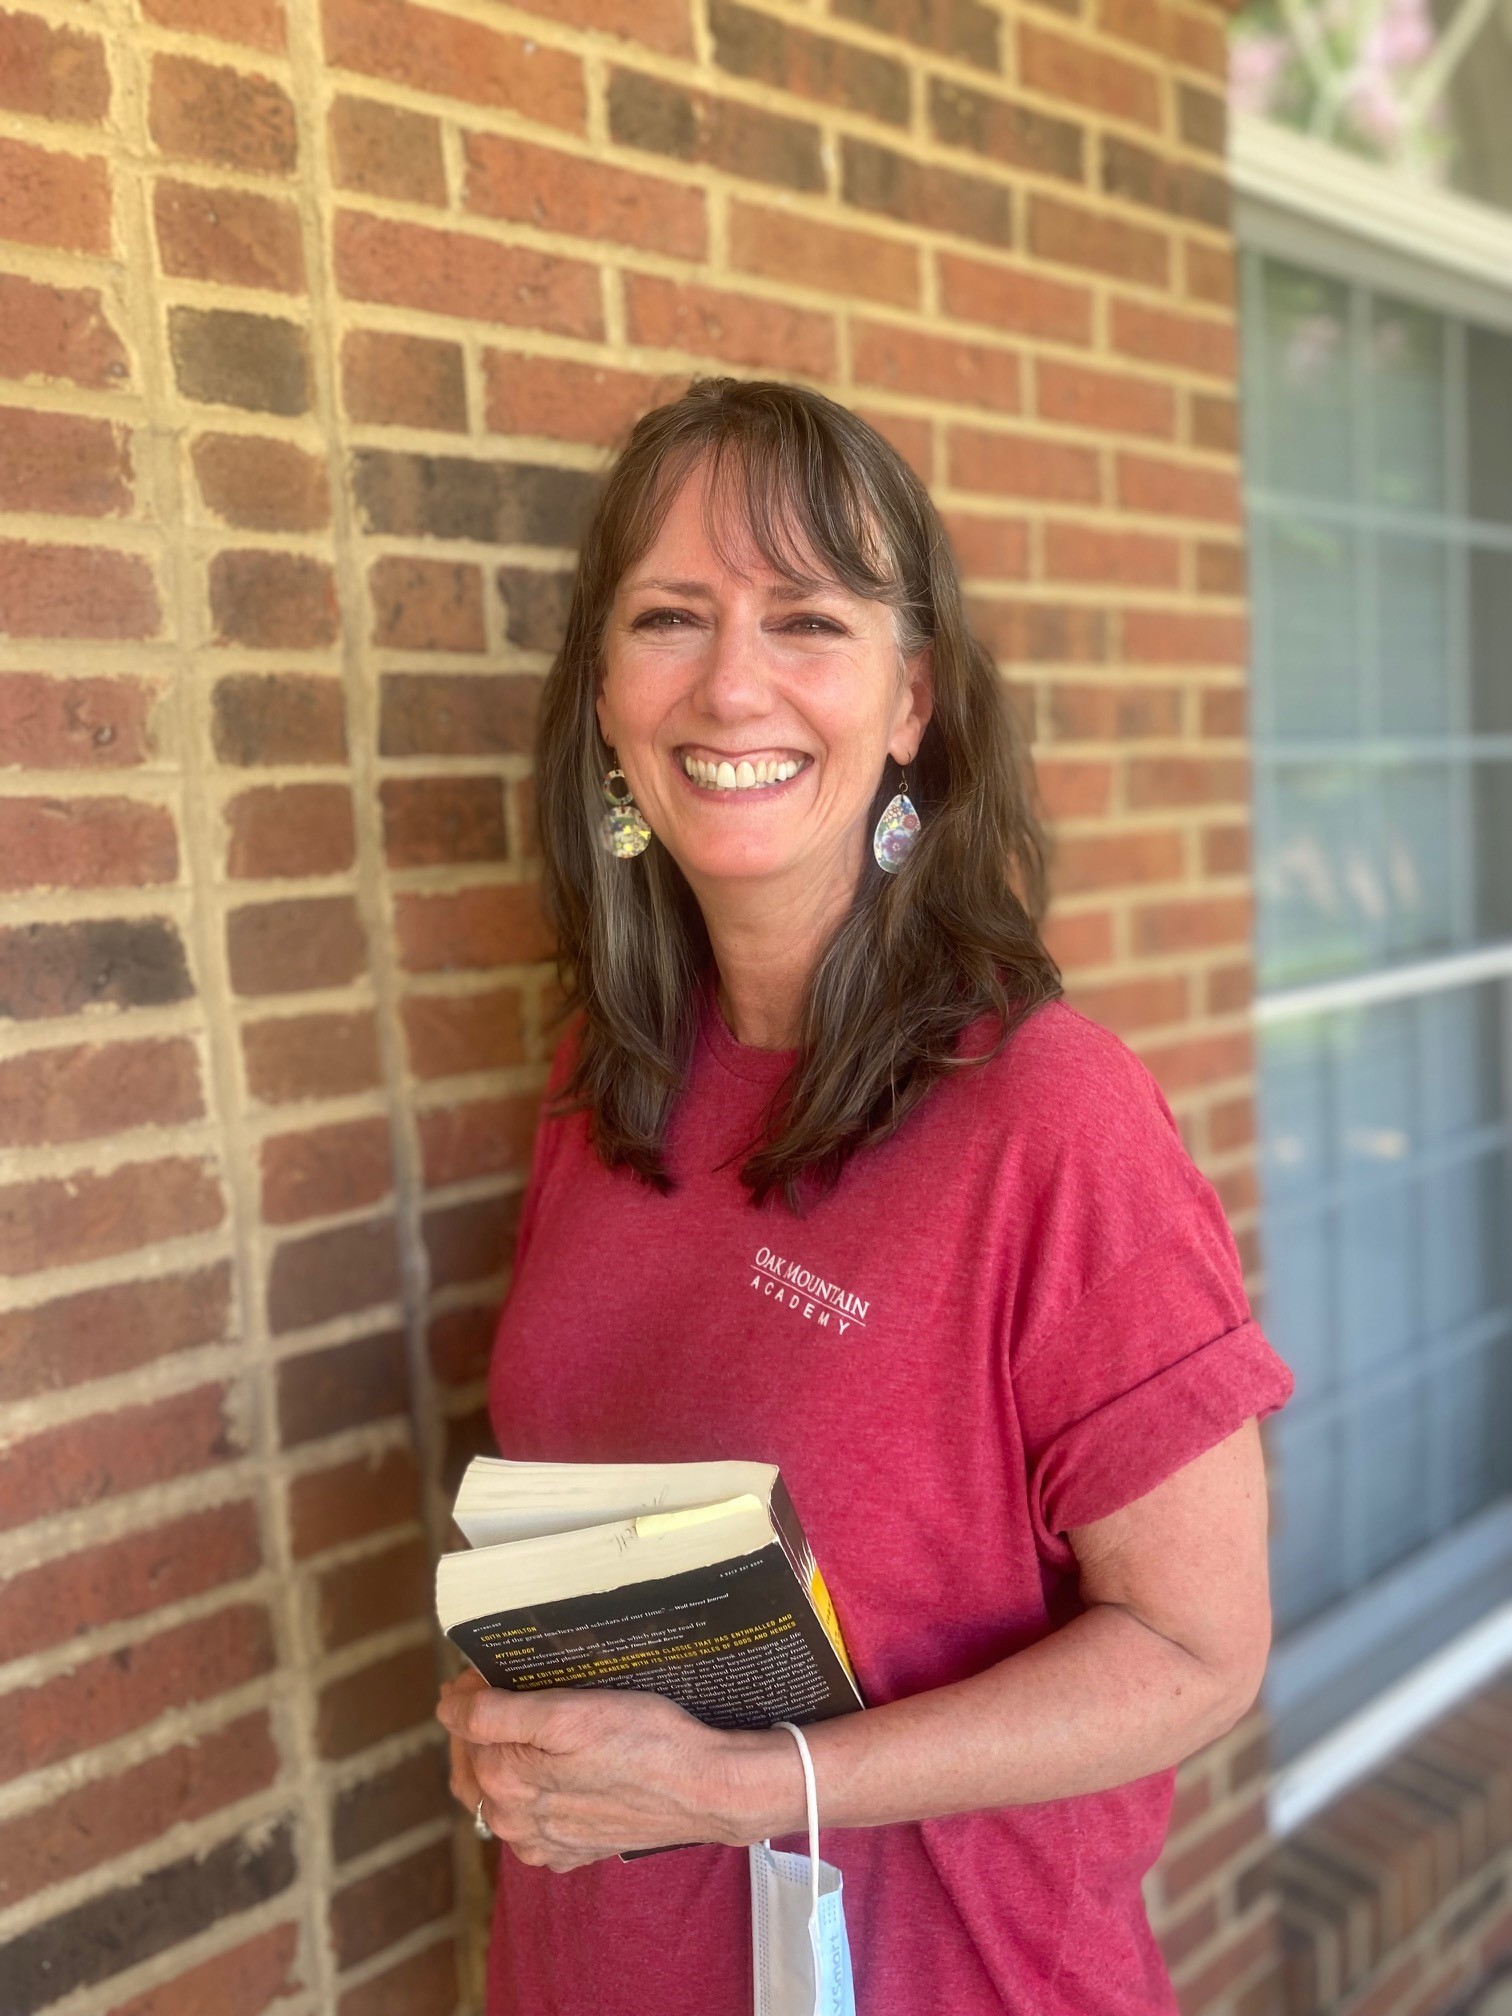 Lori Snaith